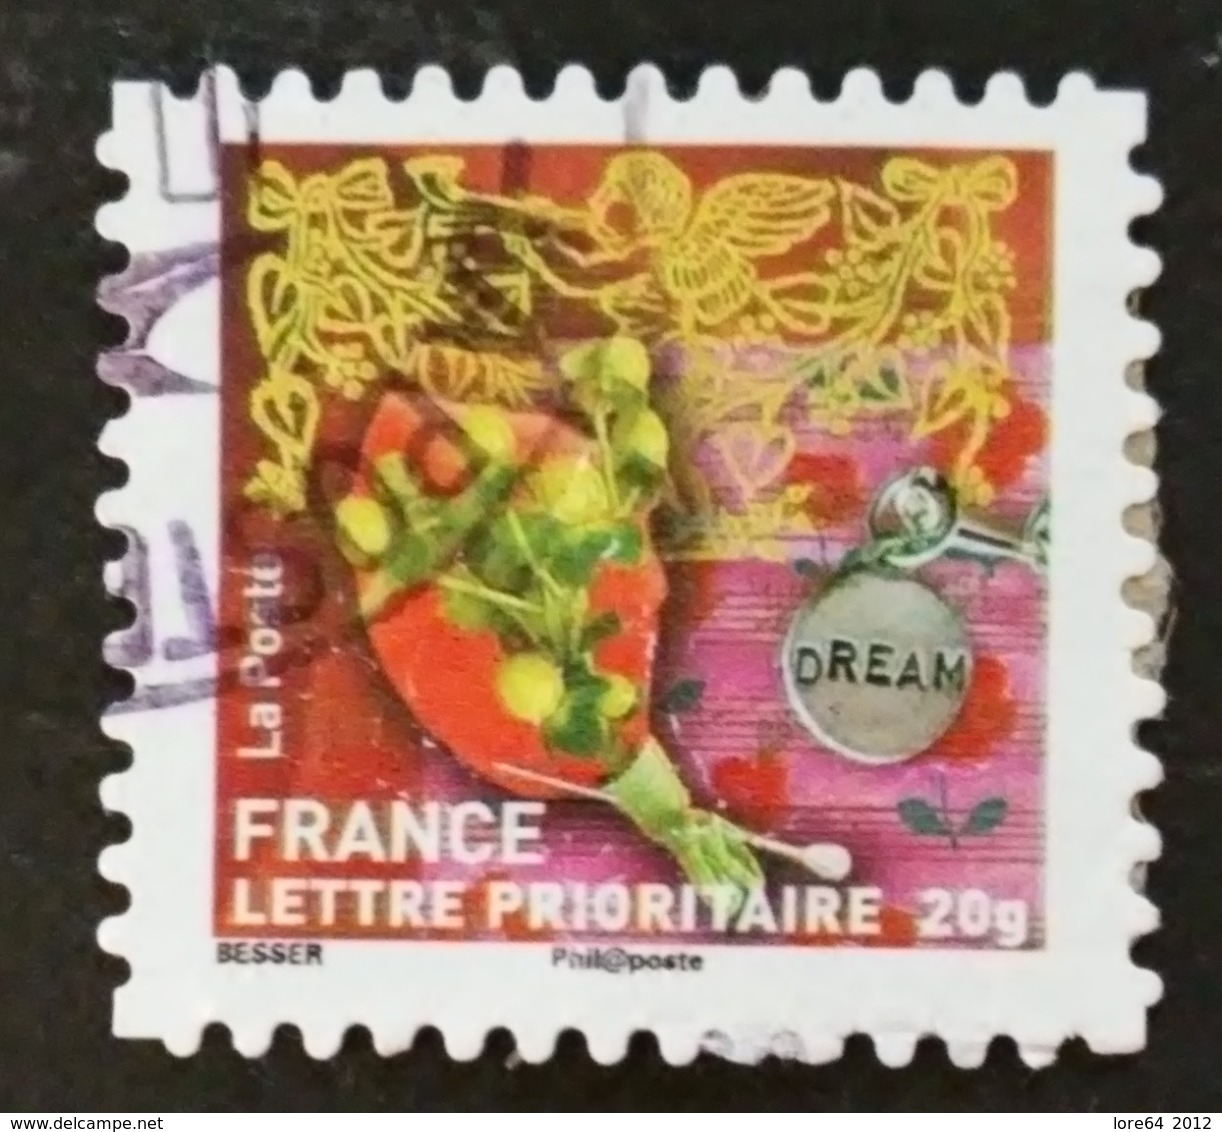 FRANCIA 2010 - 502 - France